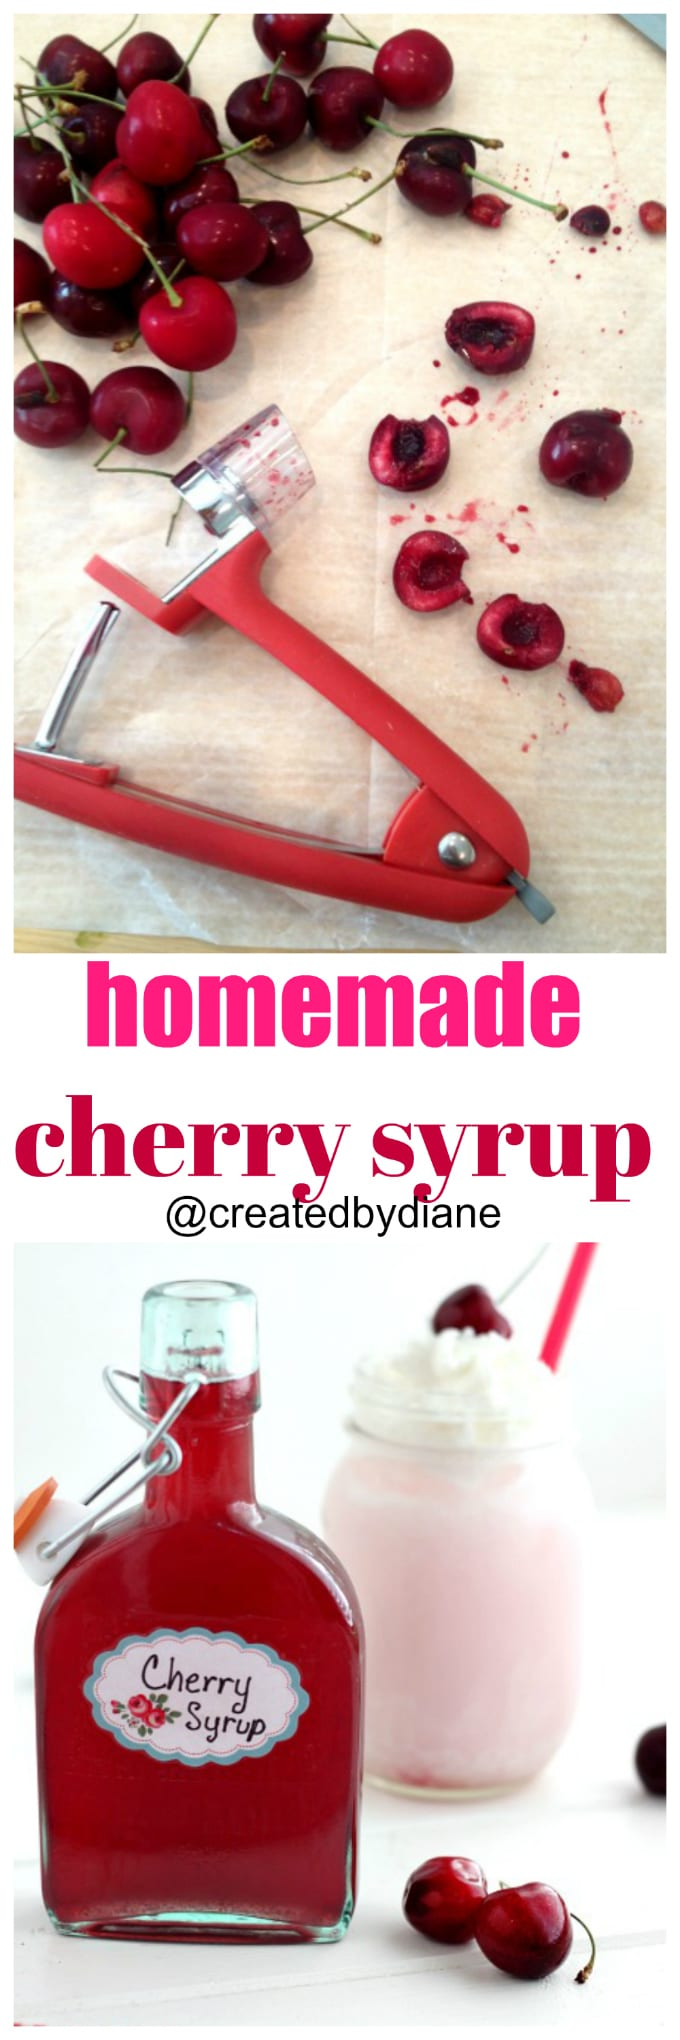 homemade cherry syrup @createdbydiane